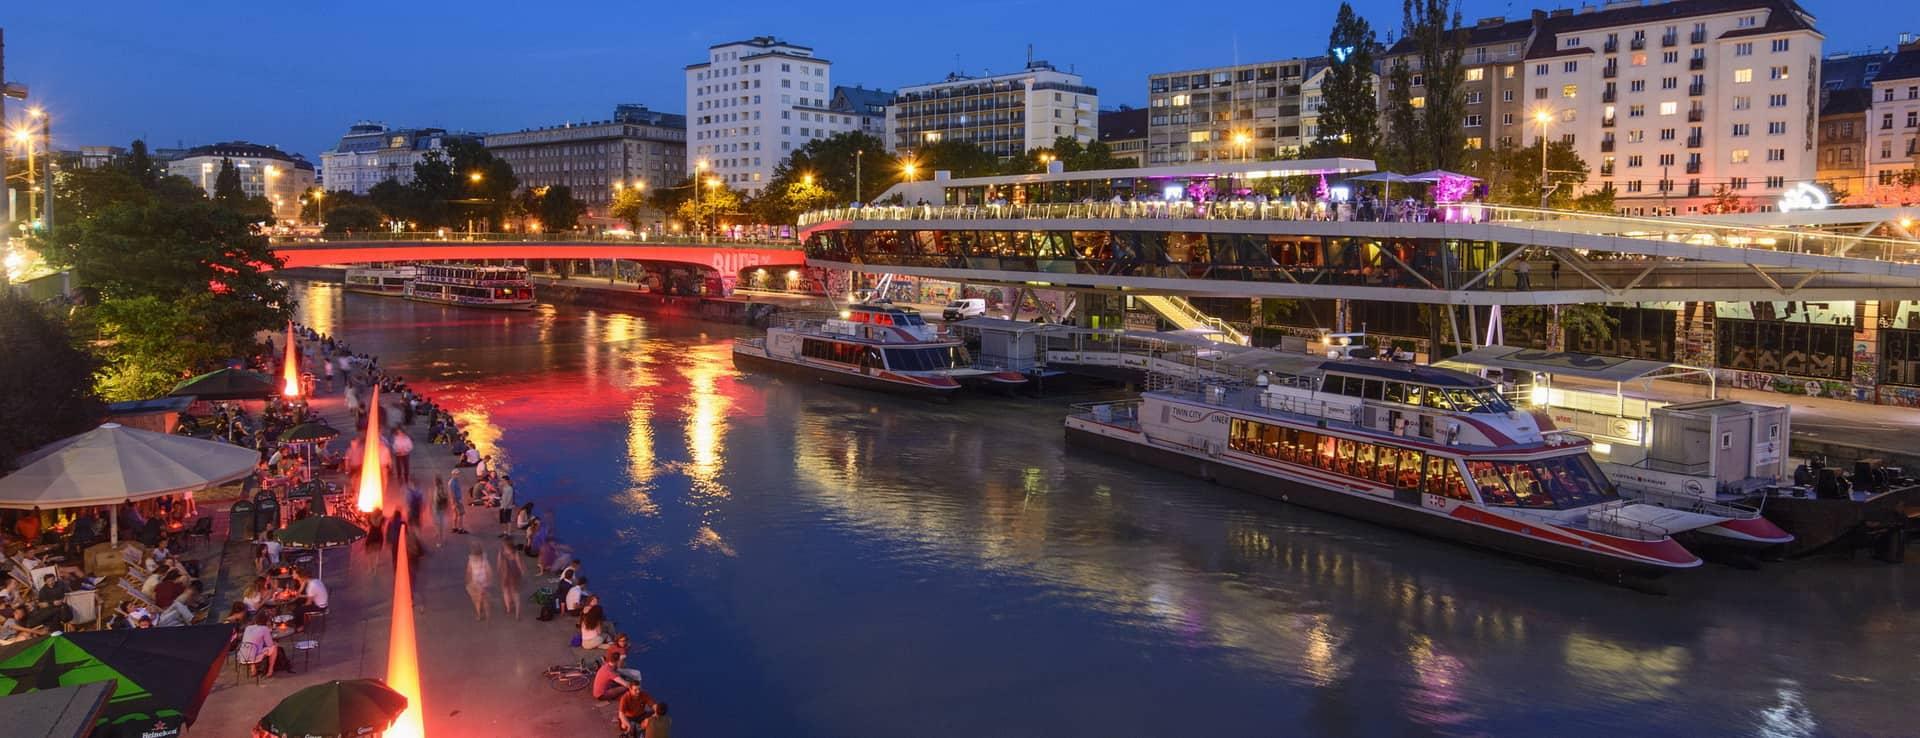 Wien Donaukanal Österrike Österreich